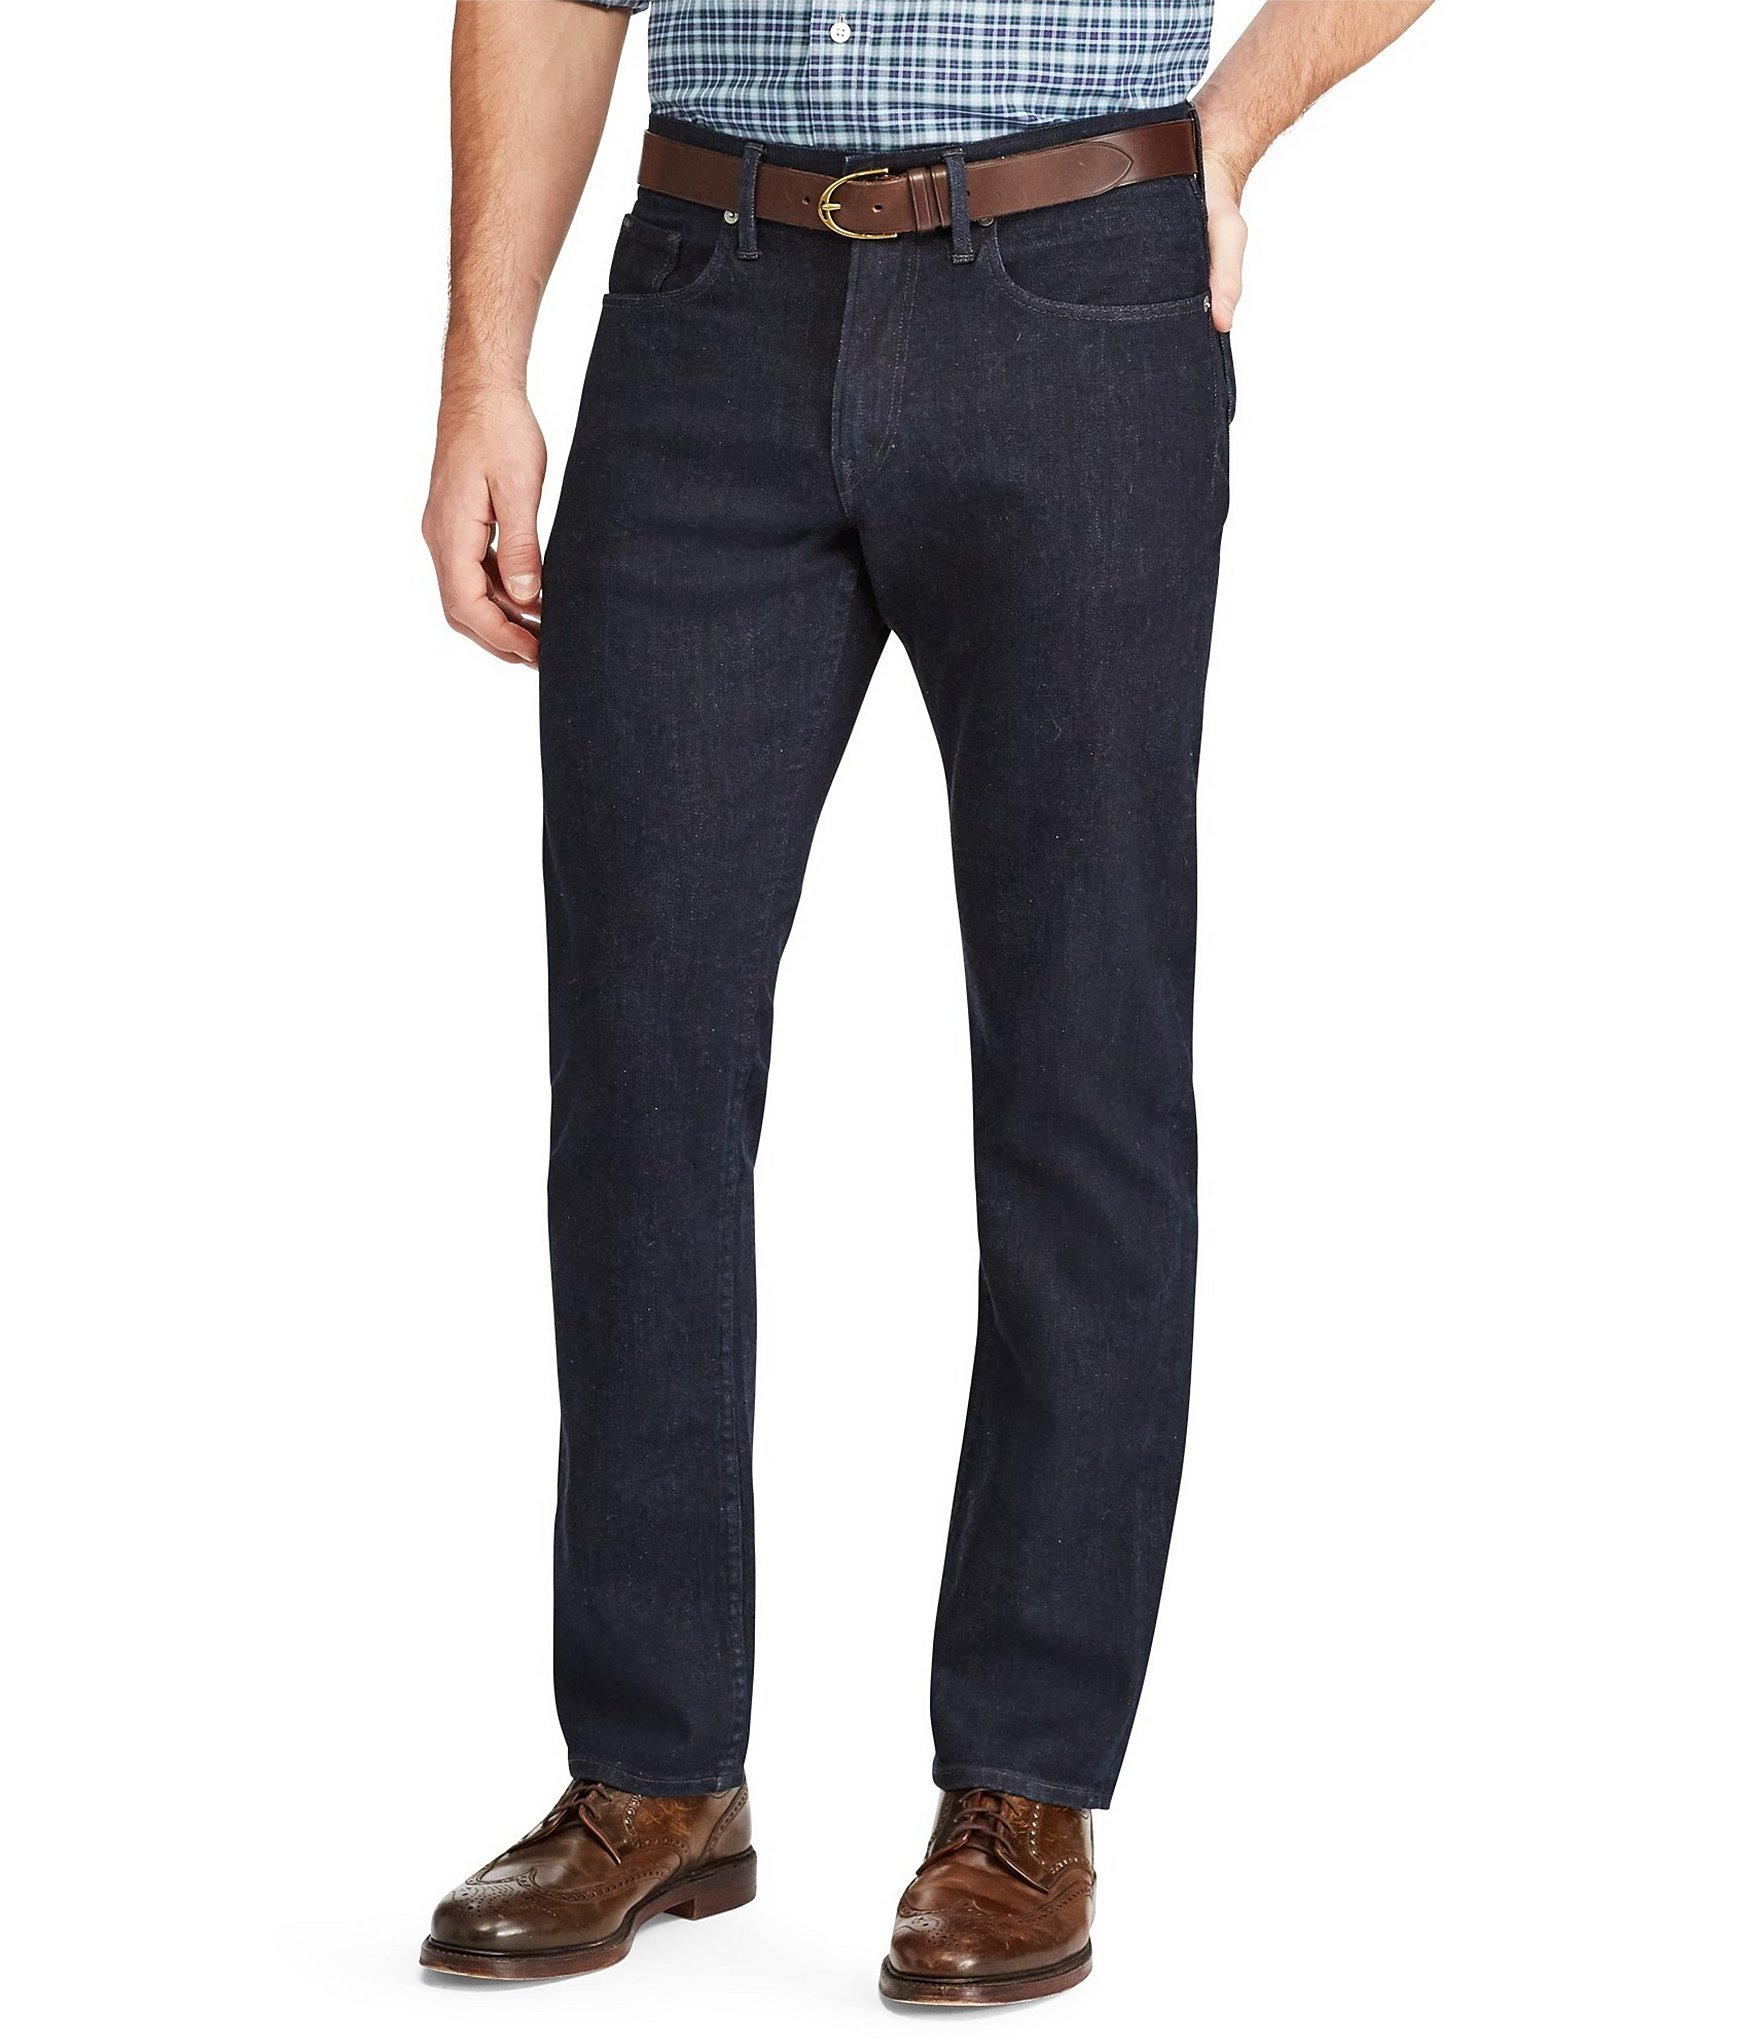 a13ec7f2 Men's Big and Tall Clothing | Dillard's